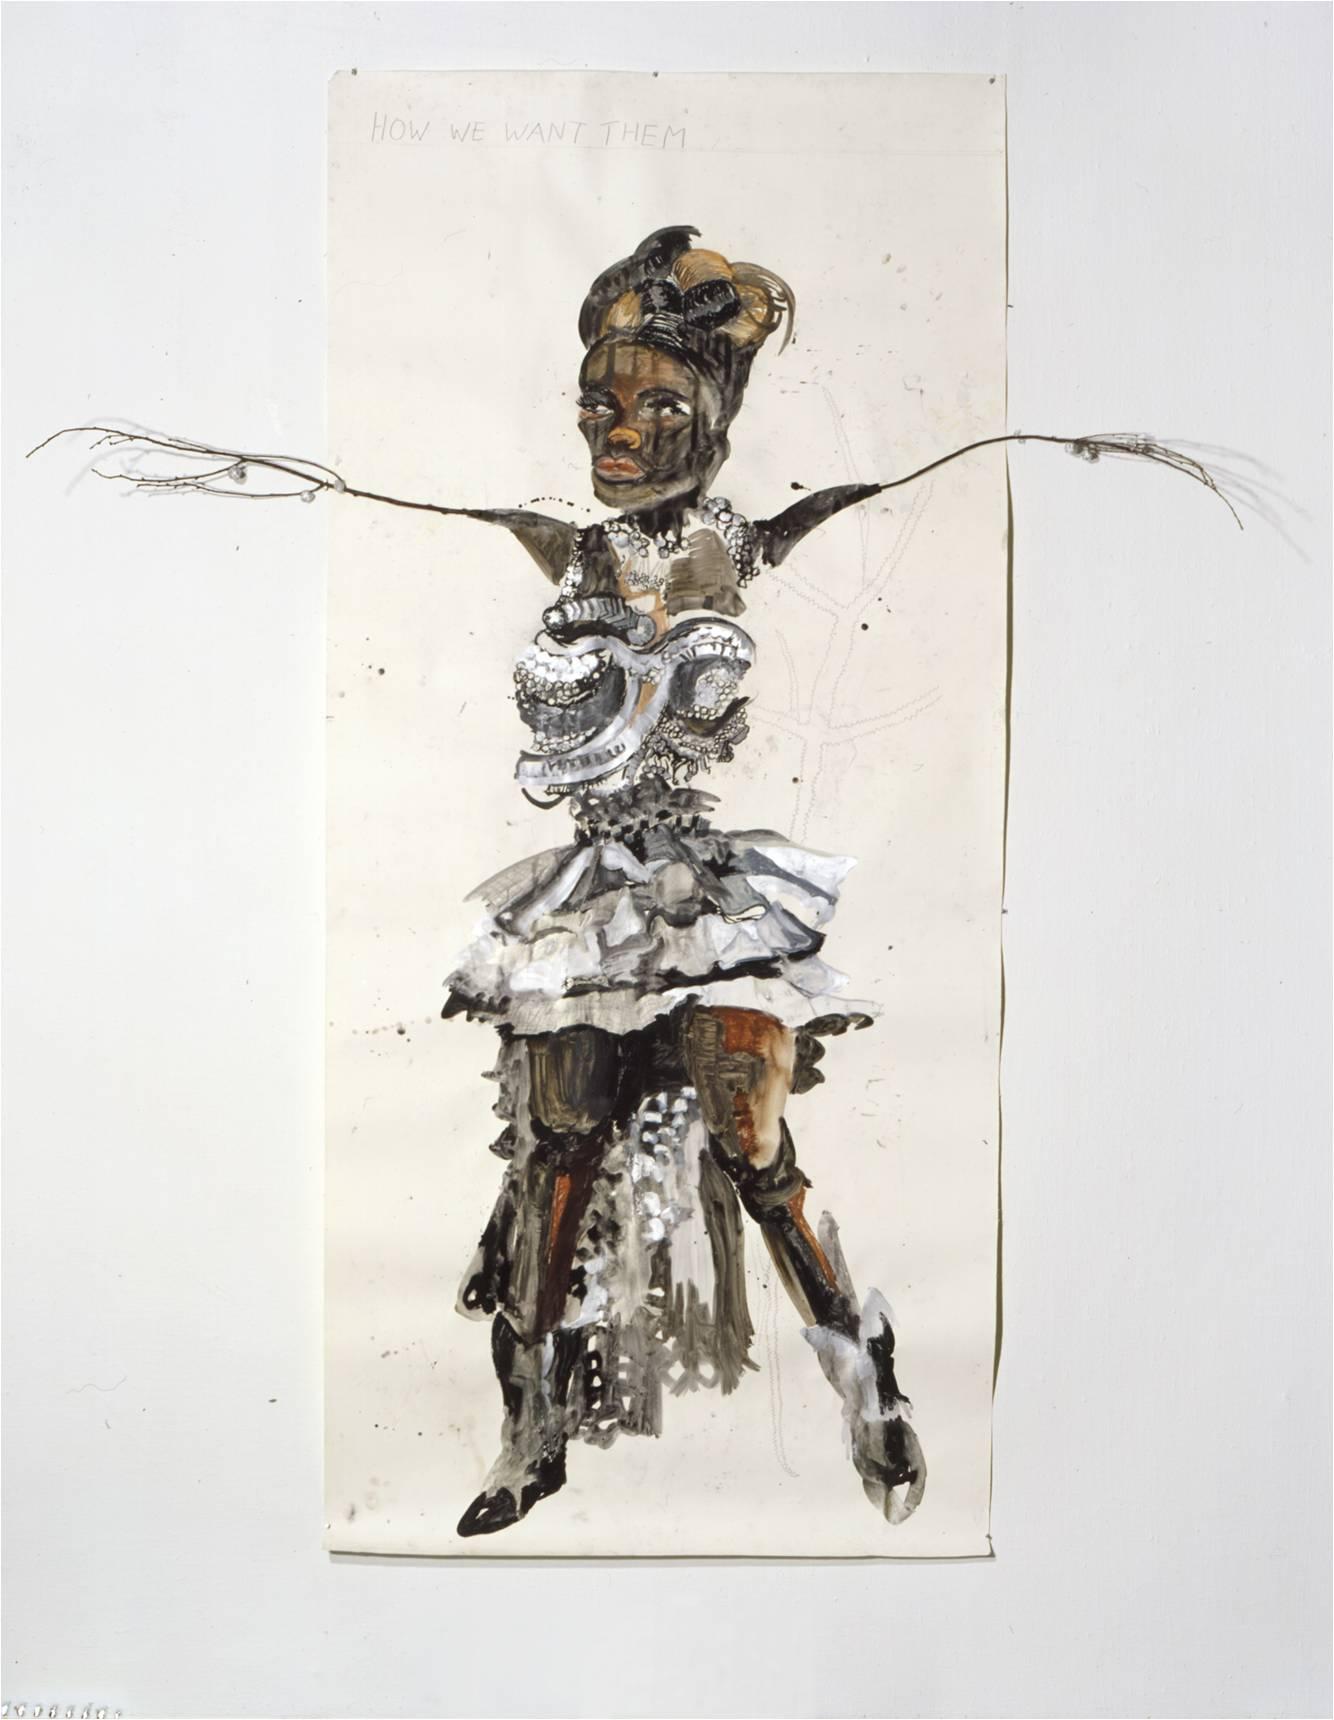 Charlotte Schleiffert, How we want them, 2000 coll Boymans van Beuningen